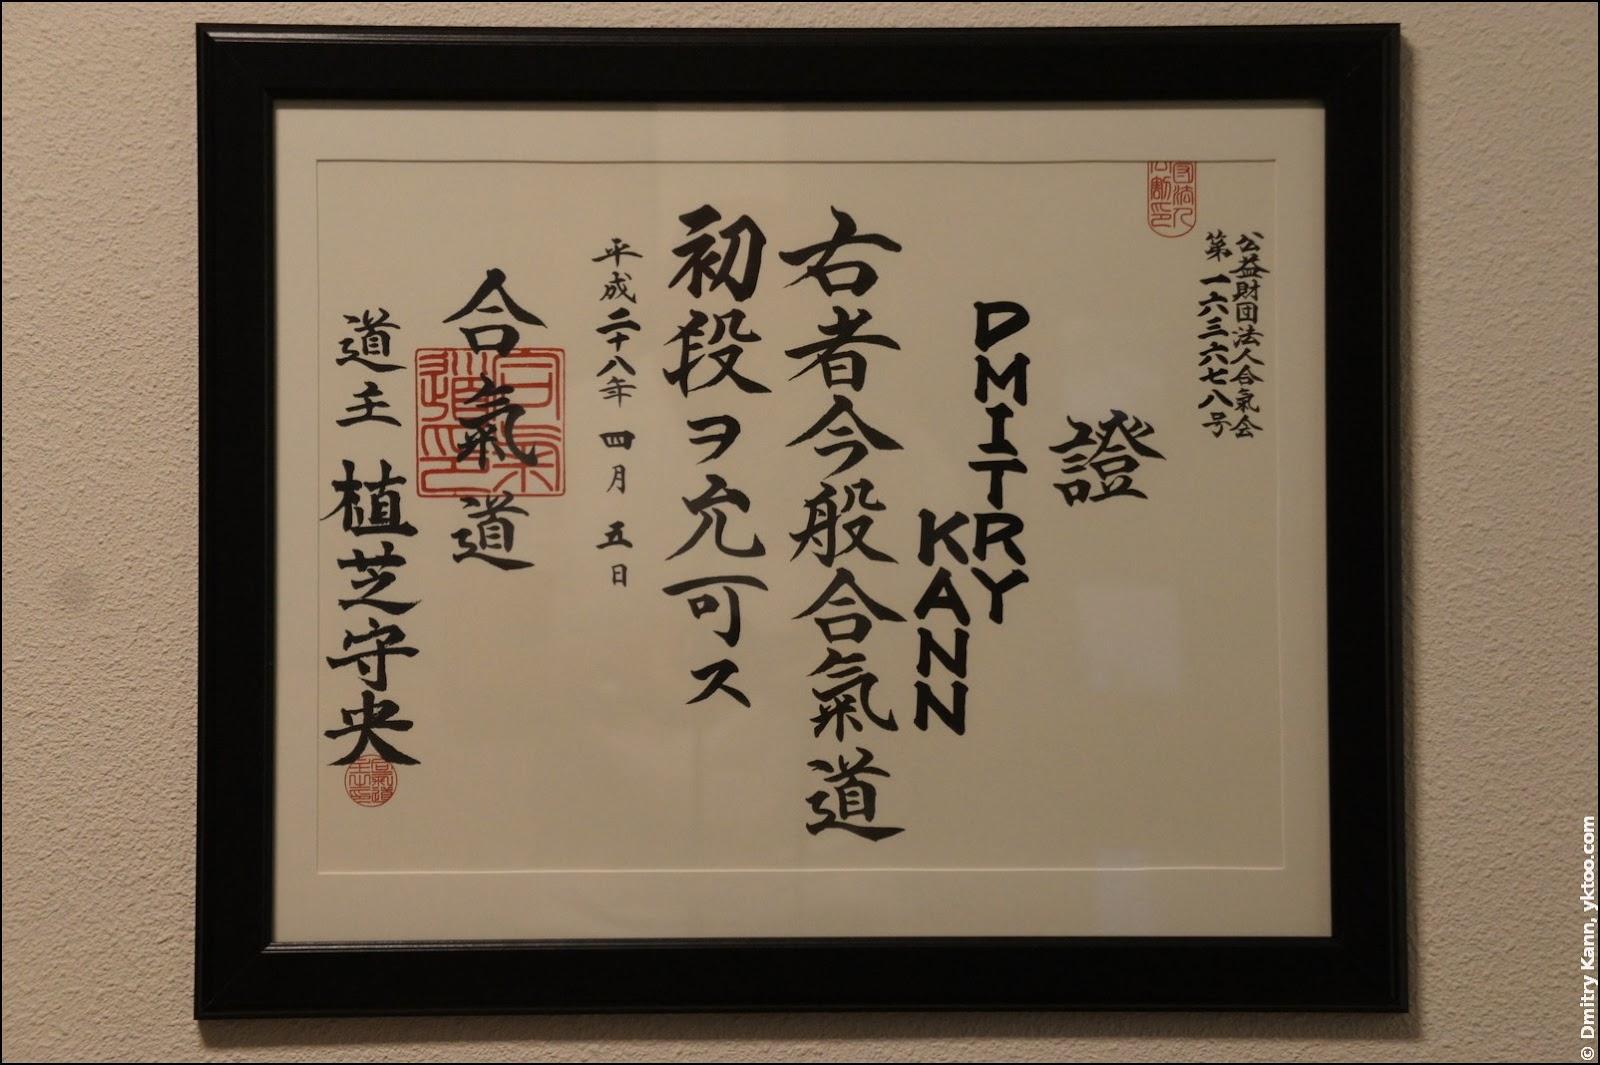 Shodan certificate.